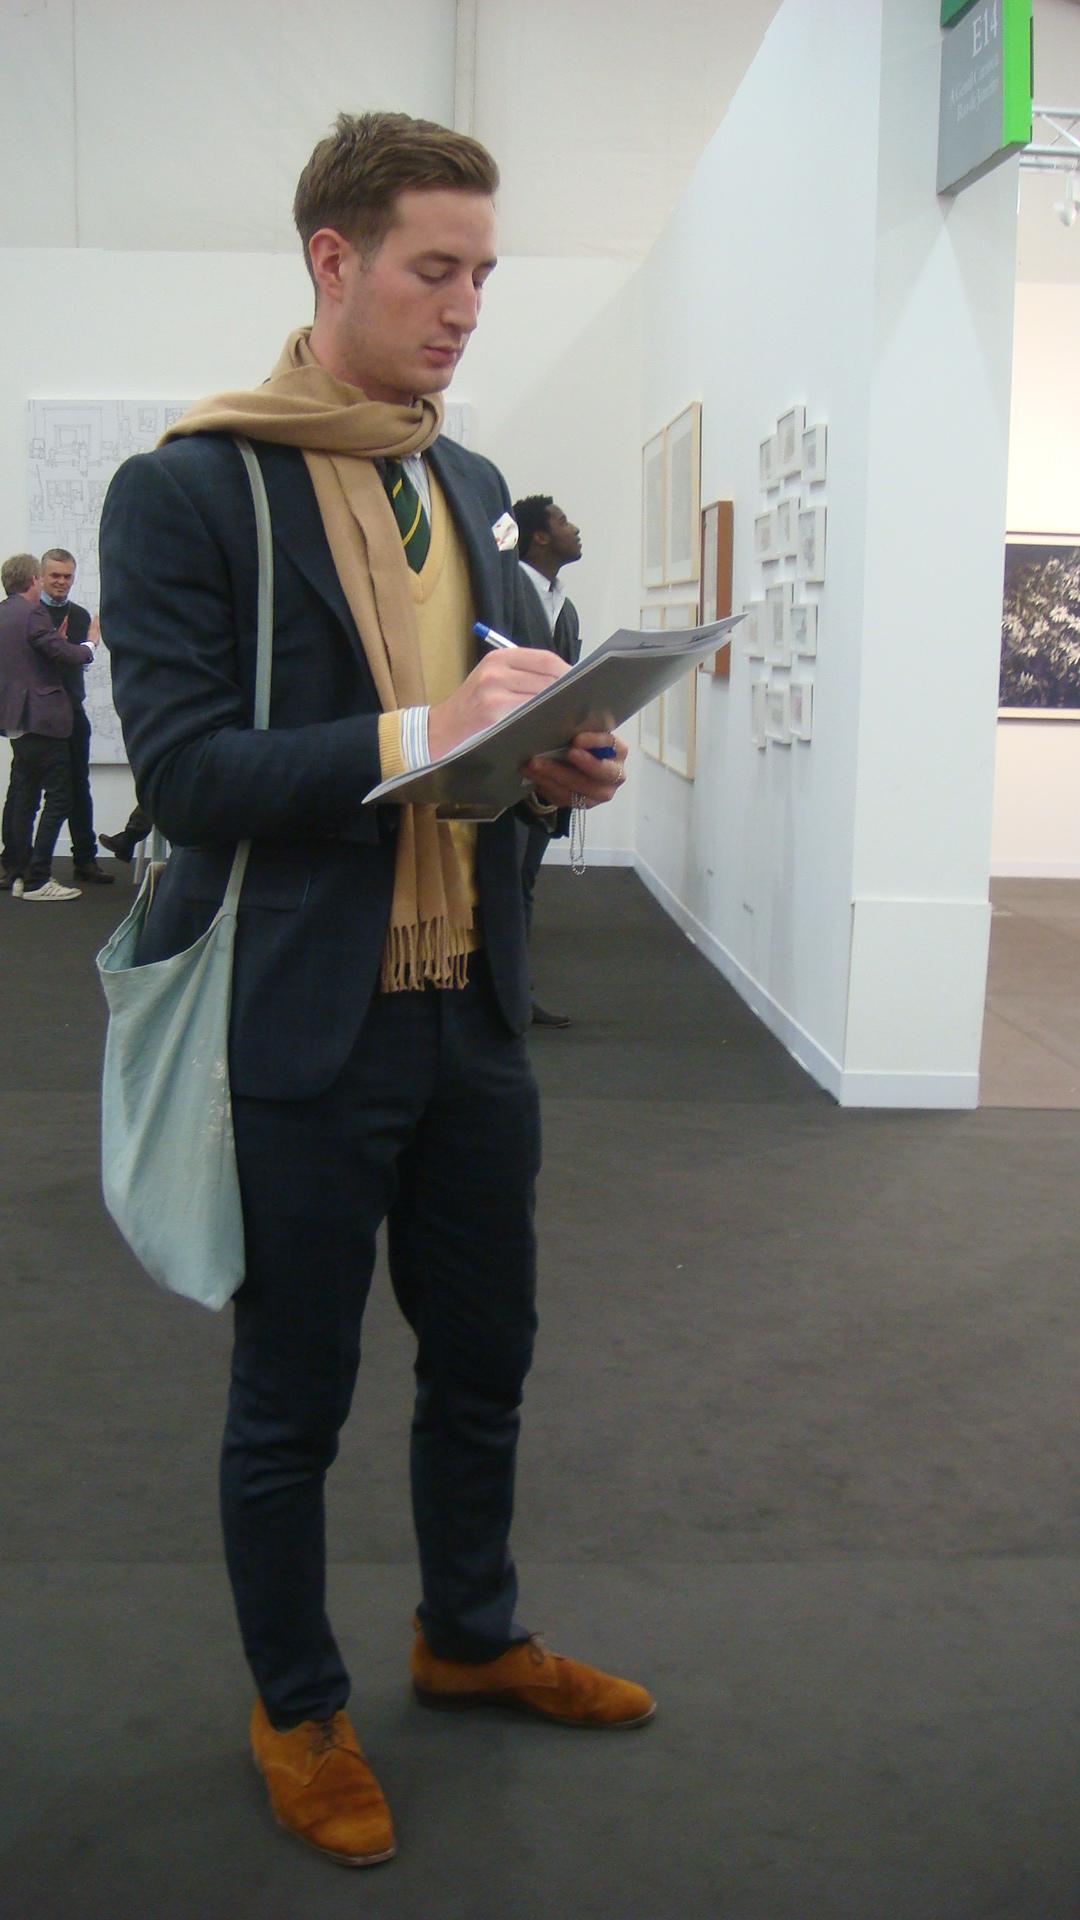 Arty (London)